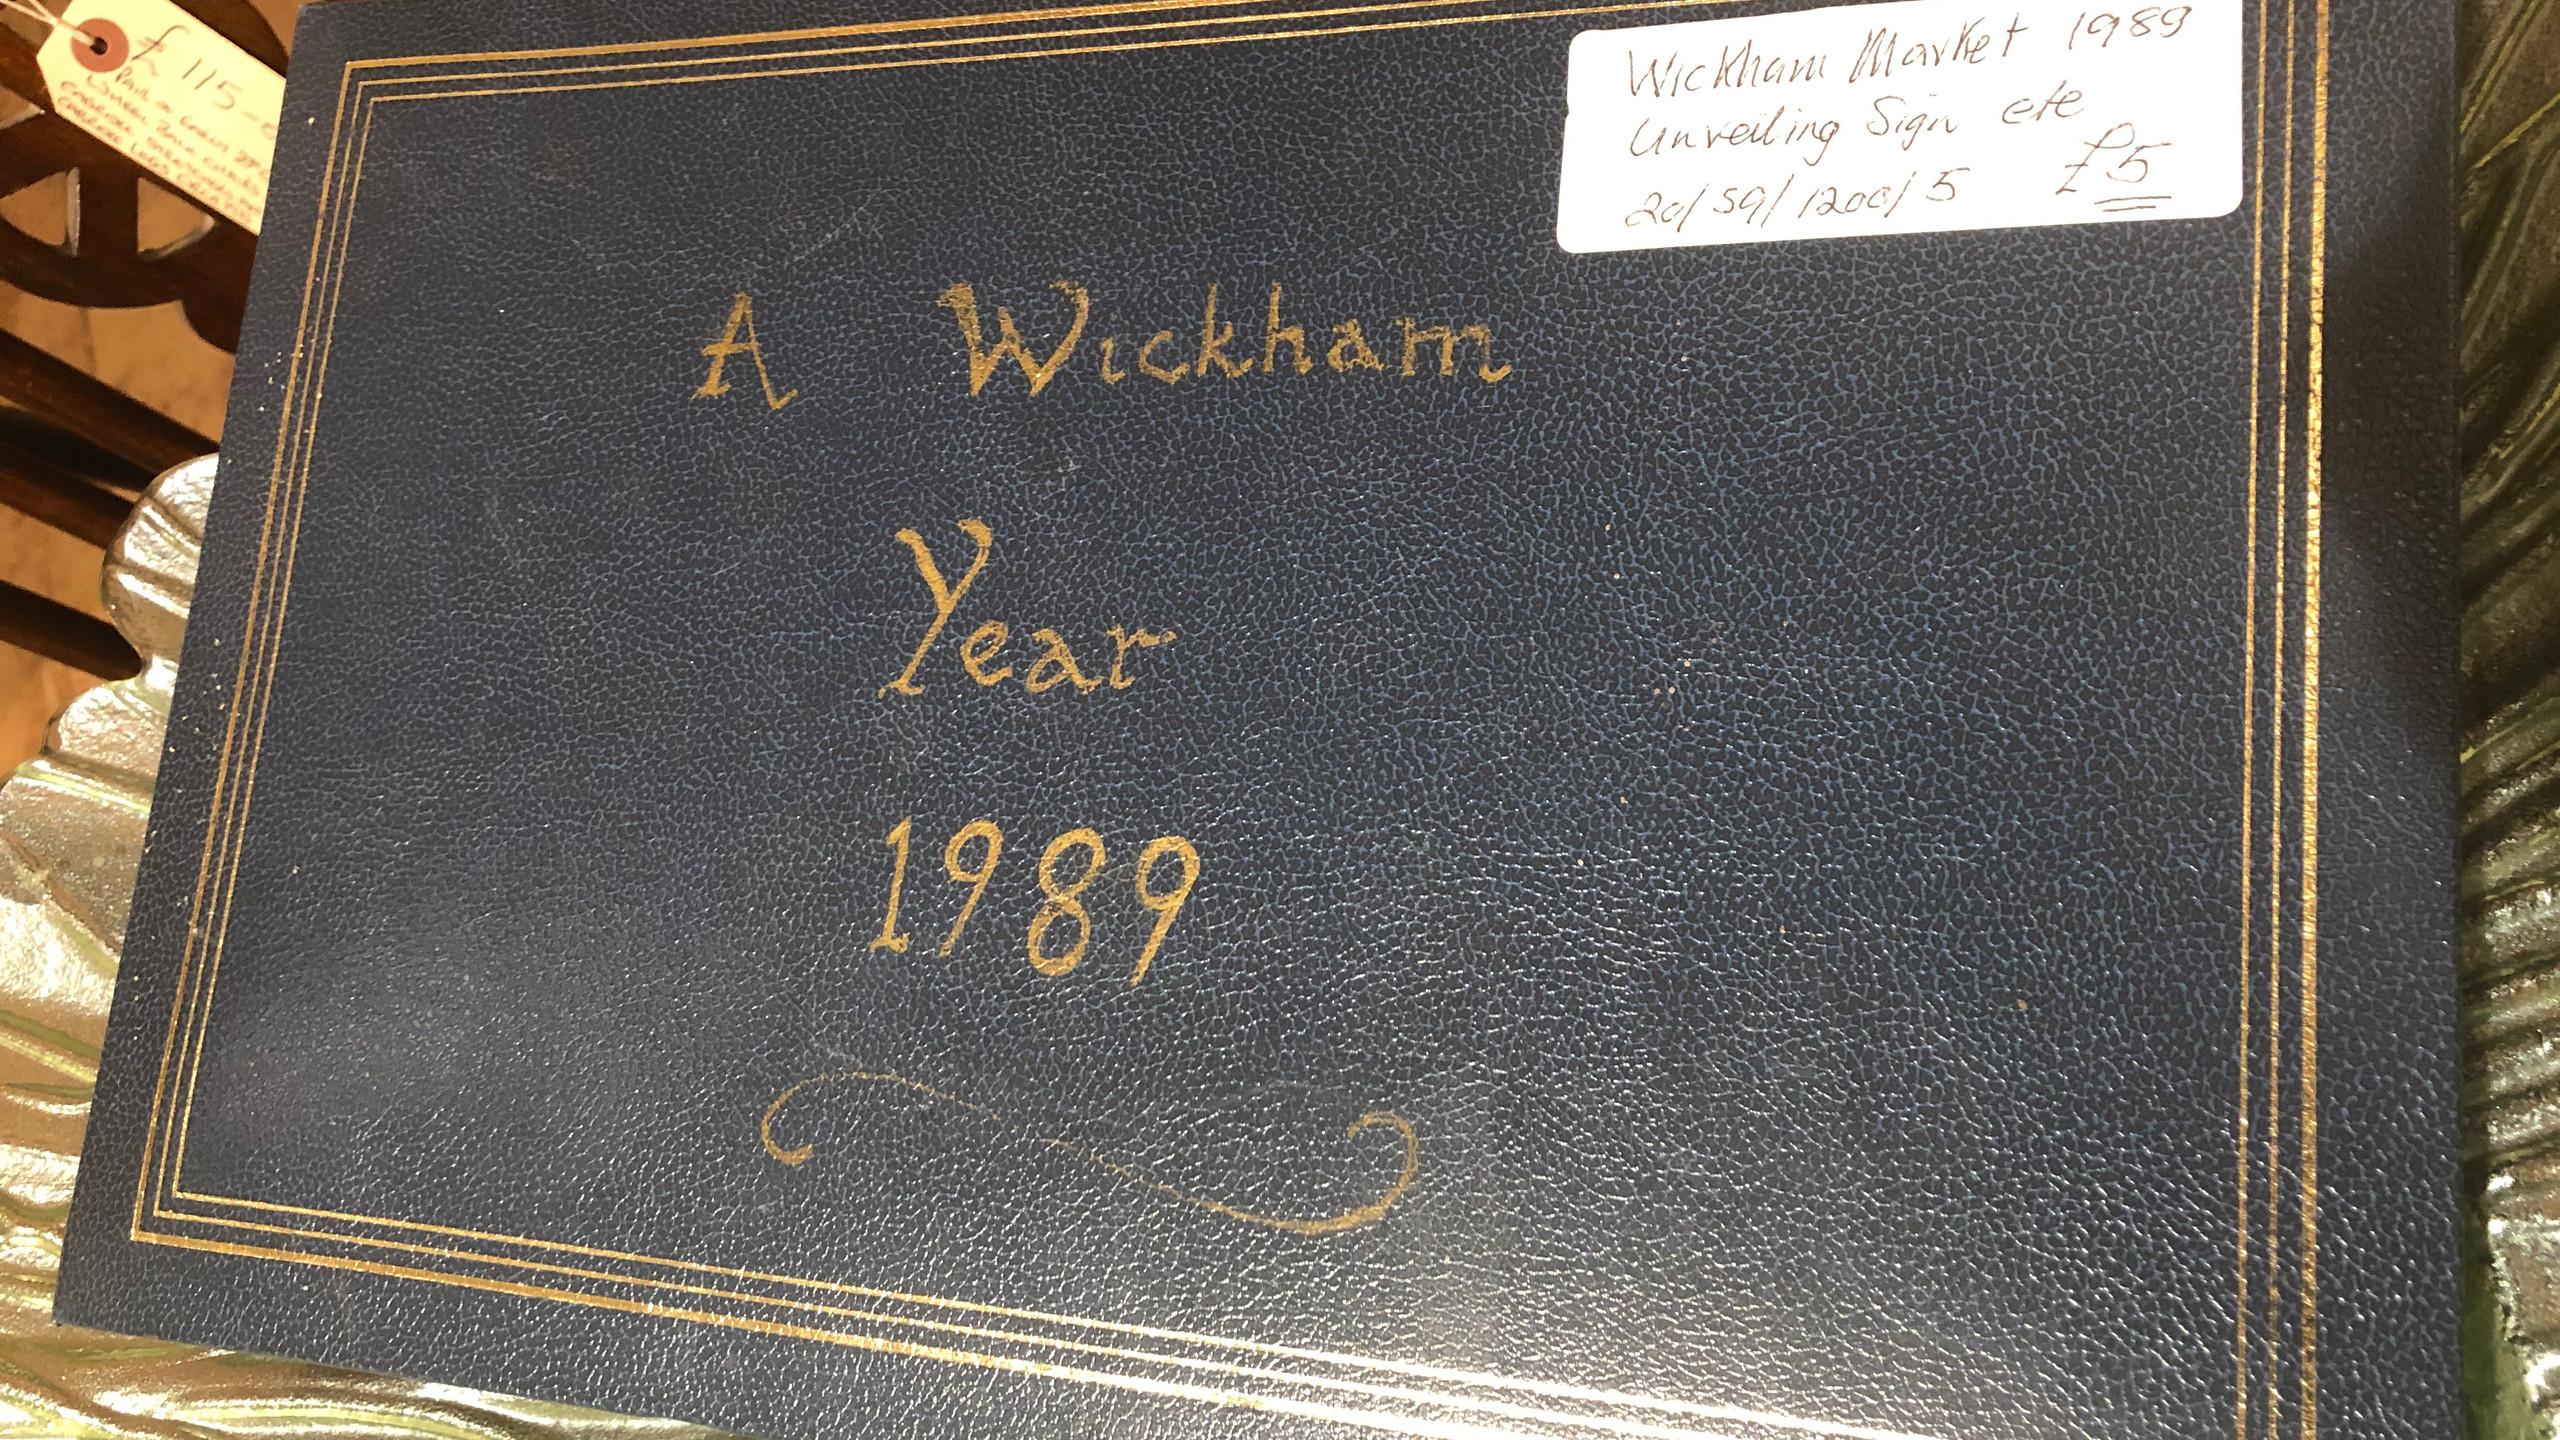 Wickham Market 1989